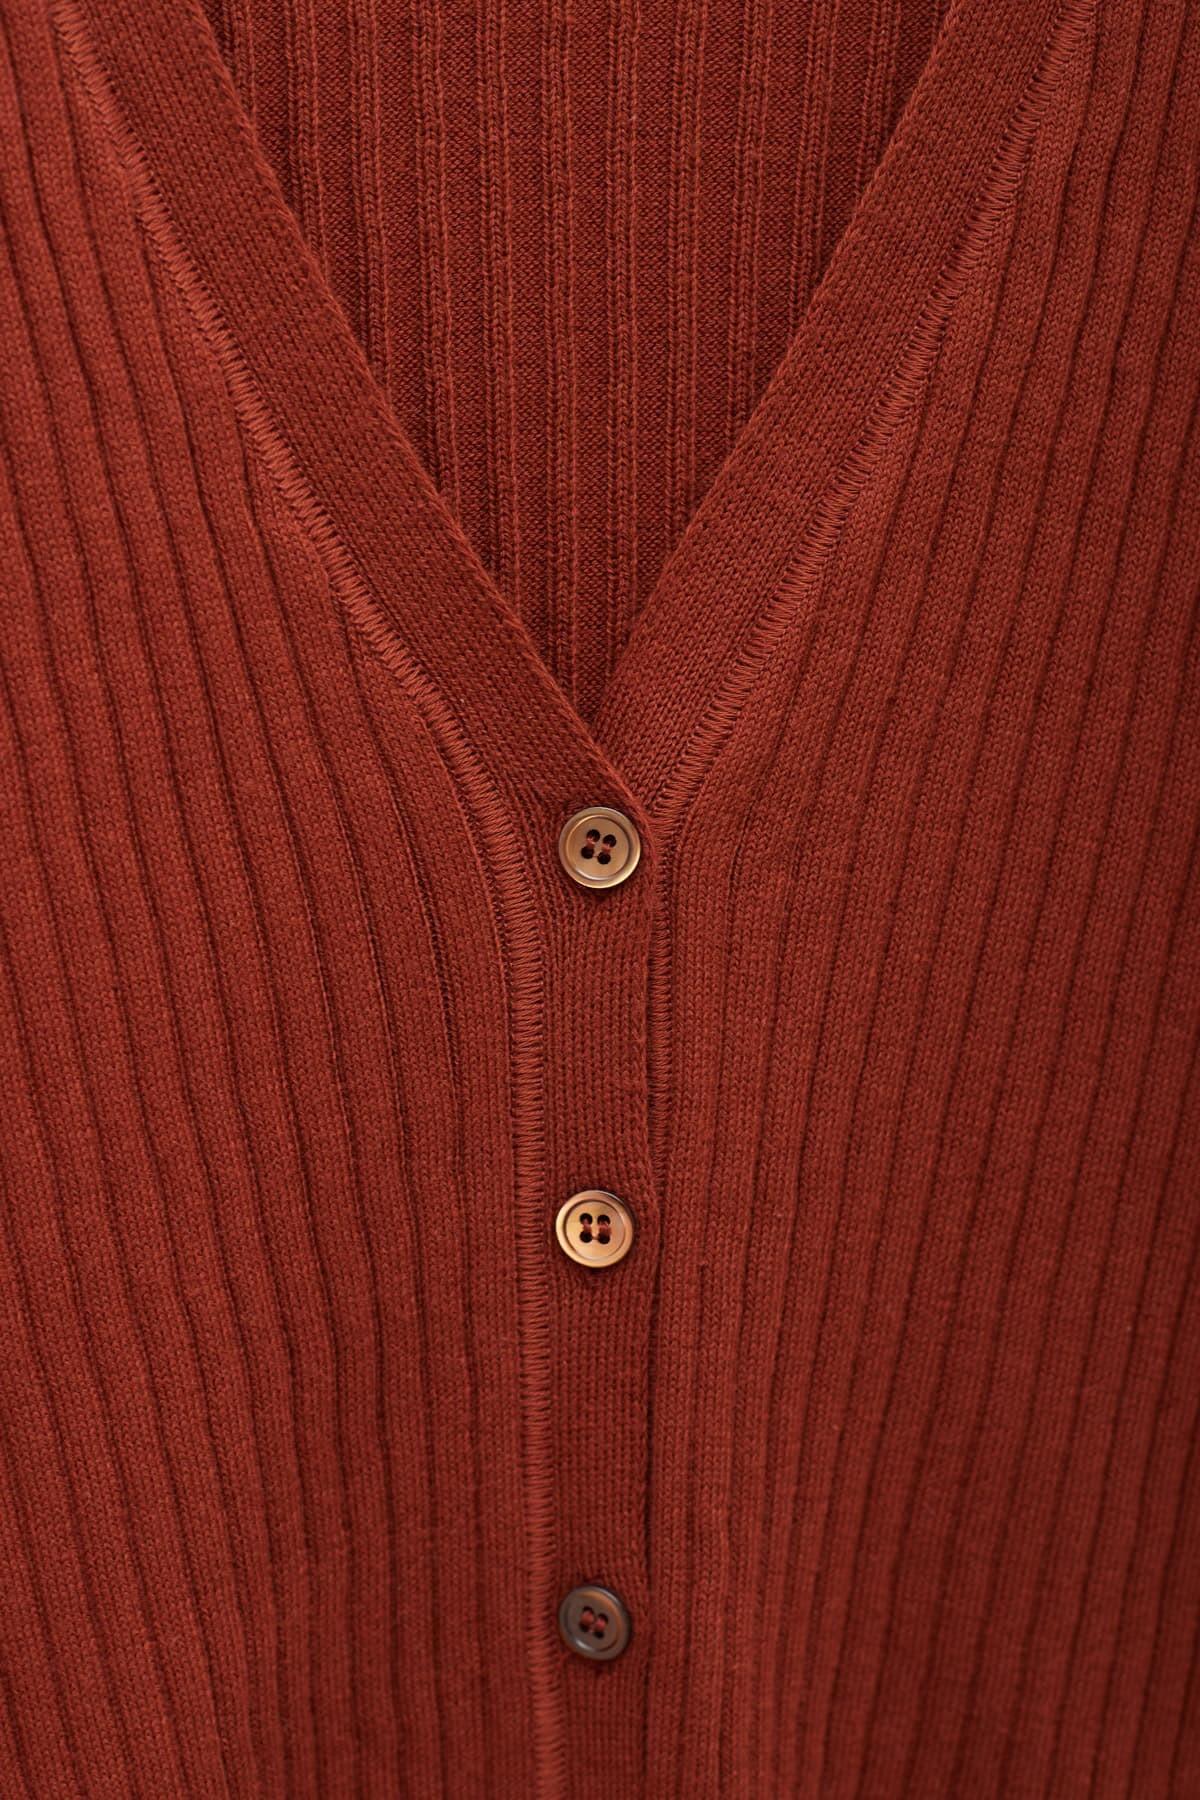 RASSVET Black Sweatshirt PACC8T027